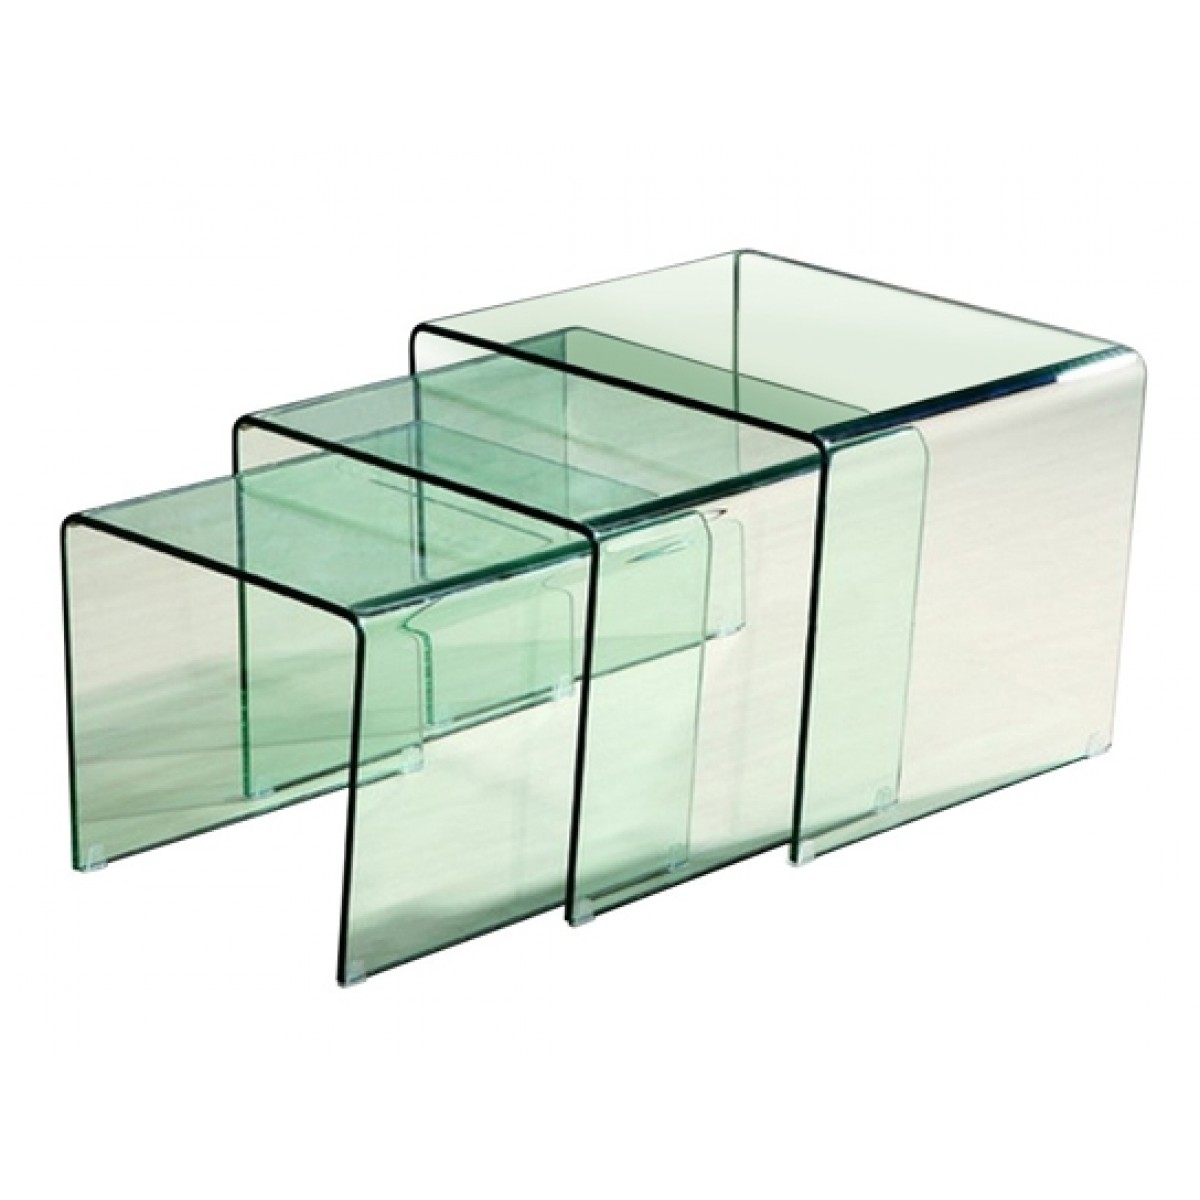 Table basse design gigogne tables basses tables consoles - Table basse gigogne design ...